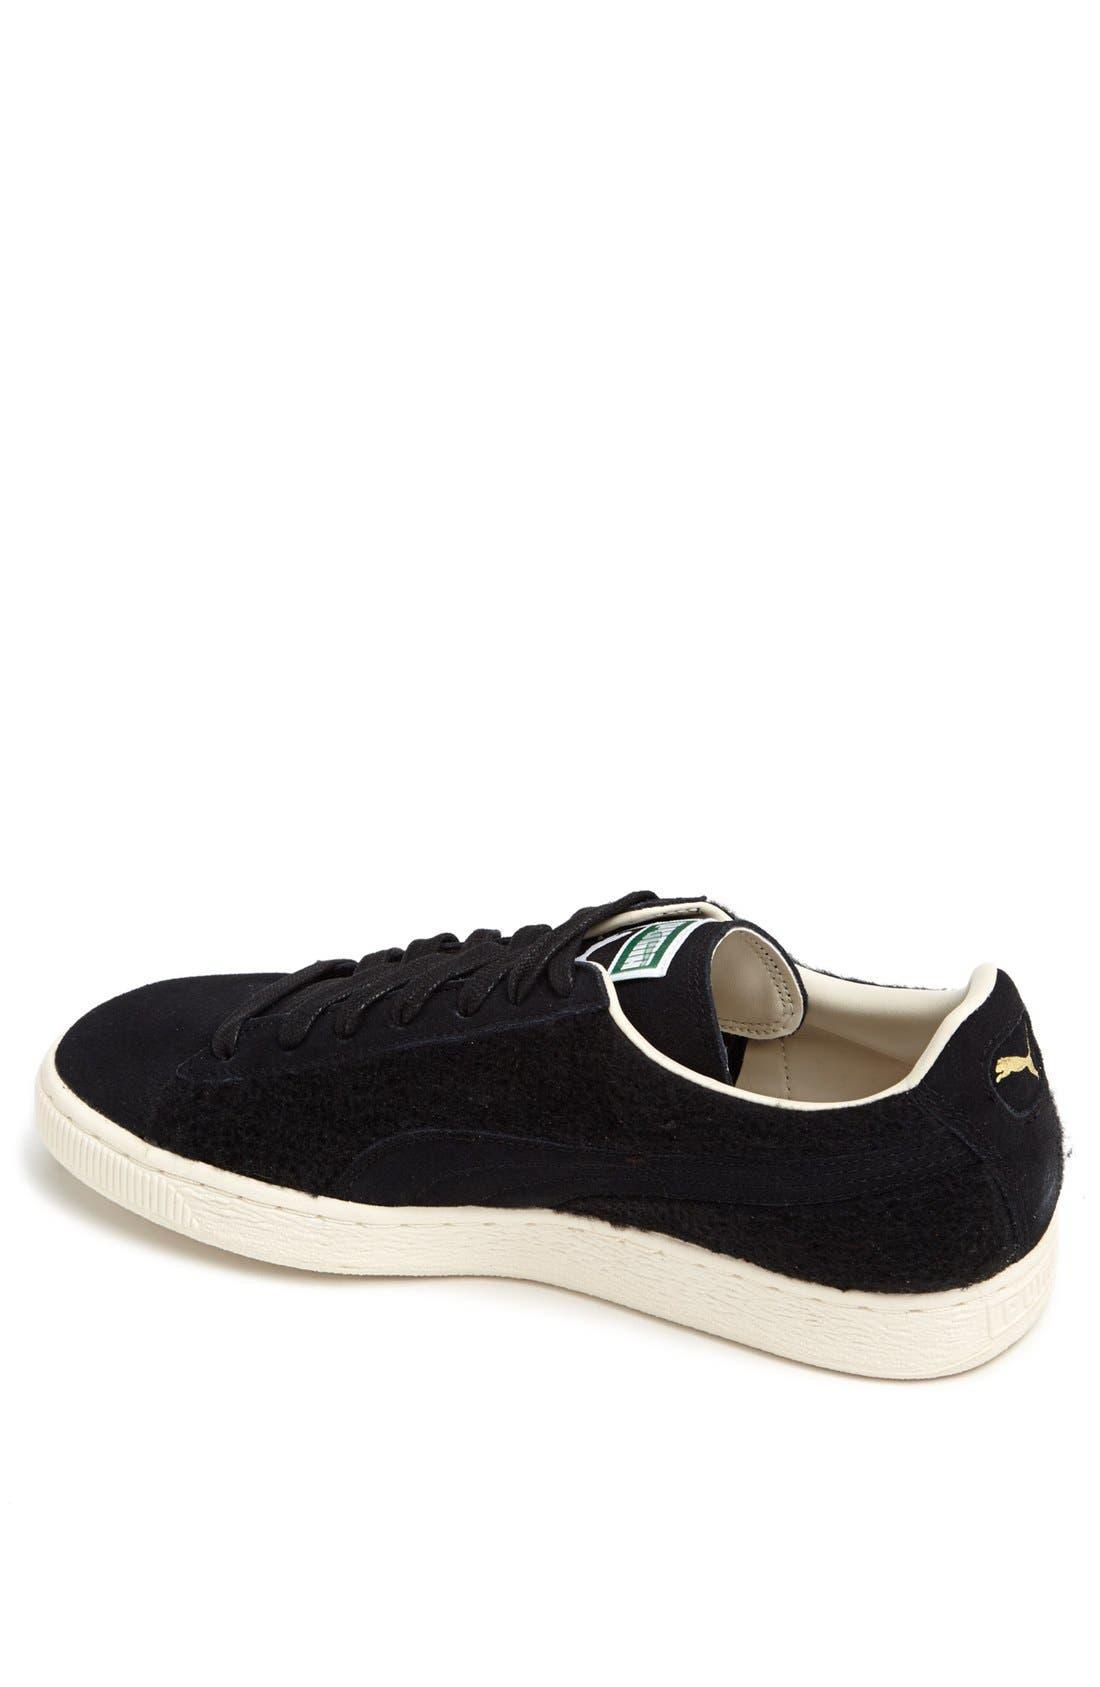 'Suede City' Sneaker,                             Alternate thumbnail 4, color,                             001